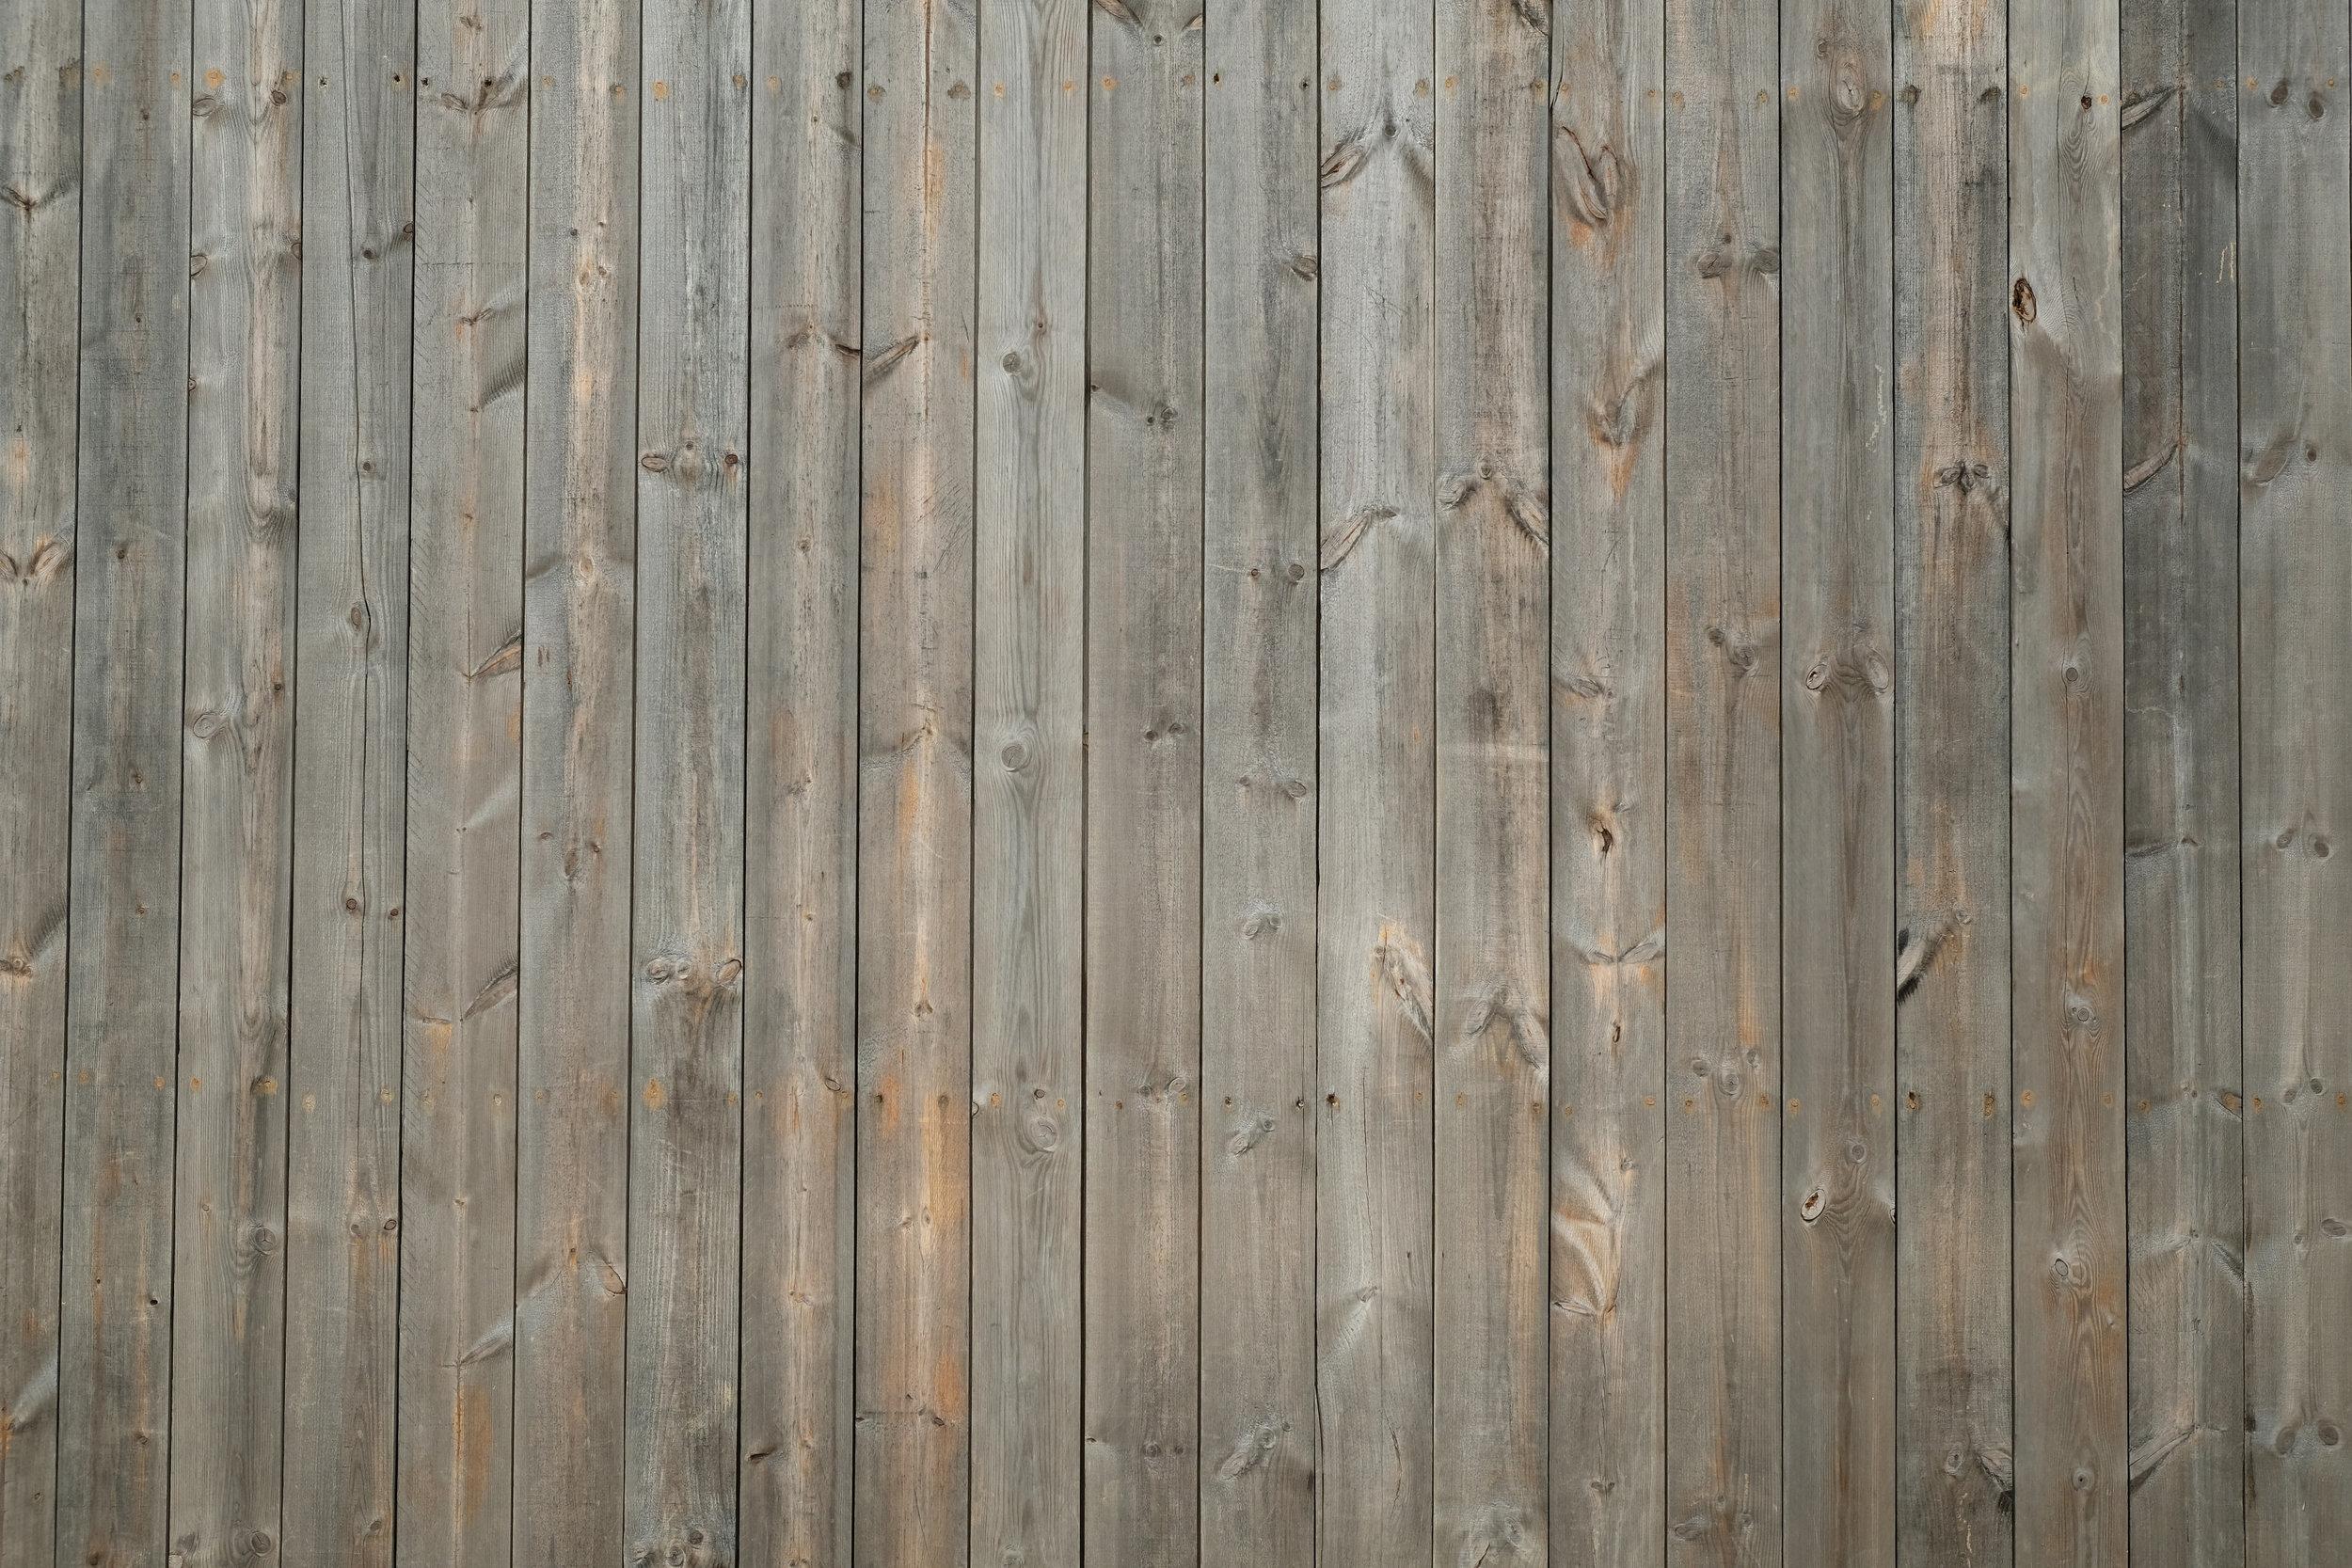 Aged reclaimed wood-1.jpg